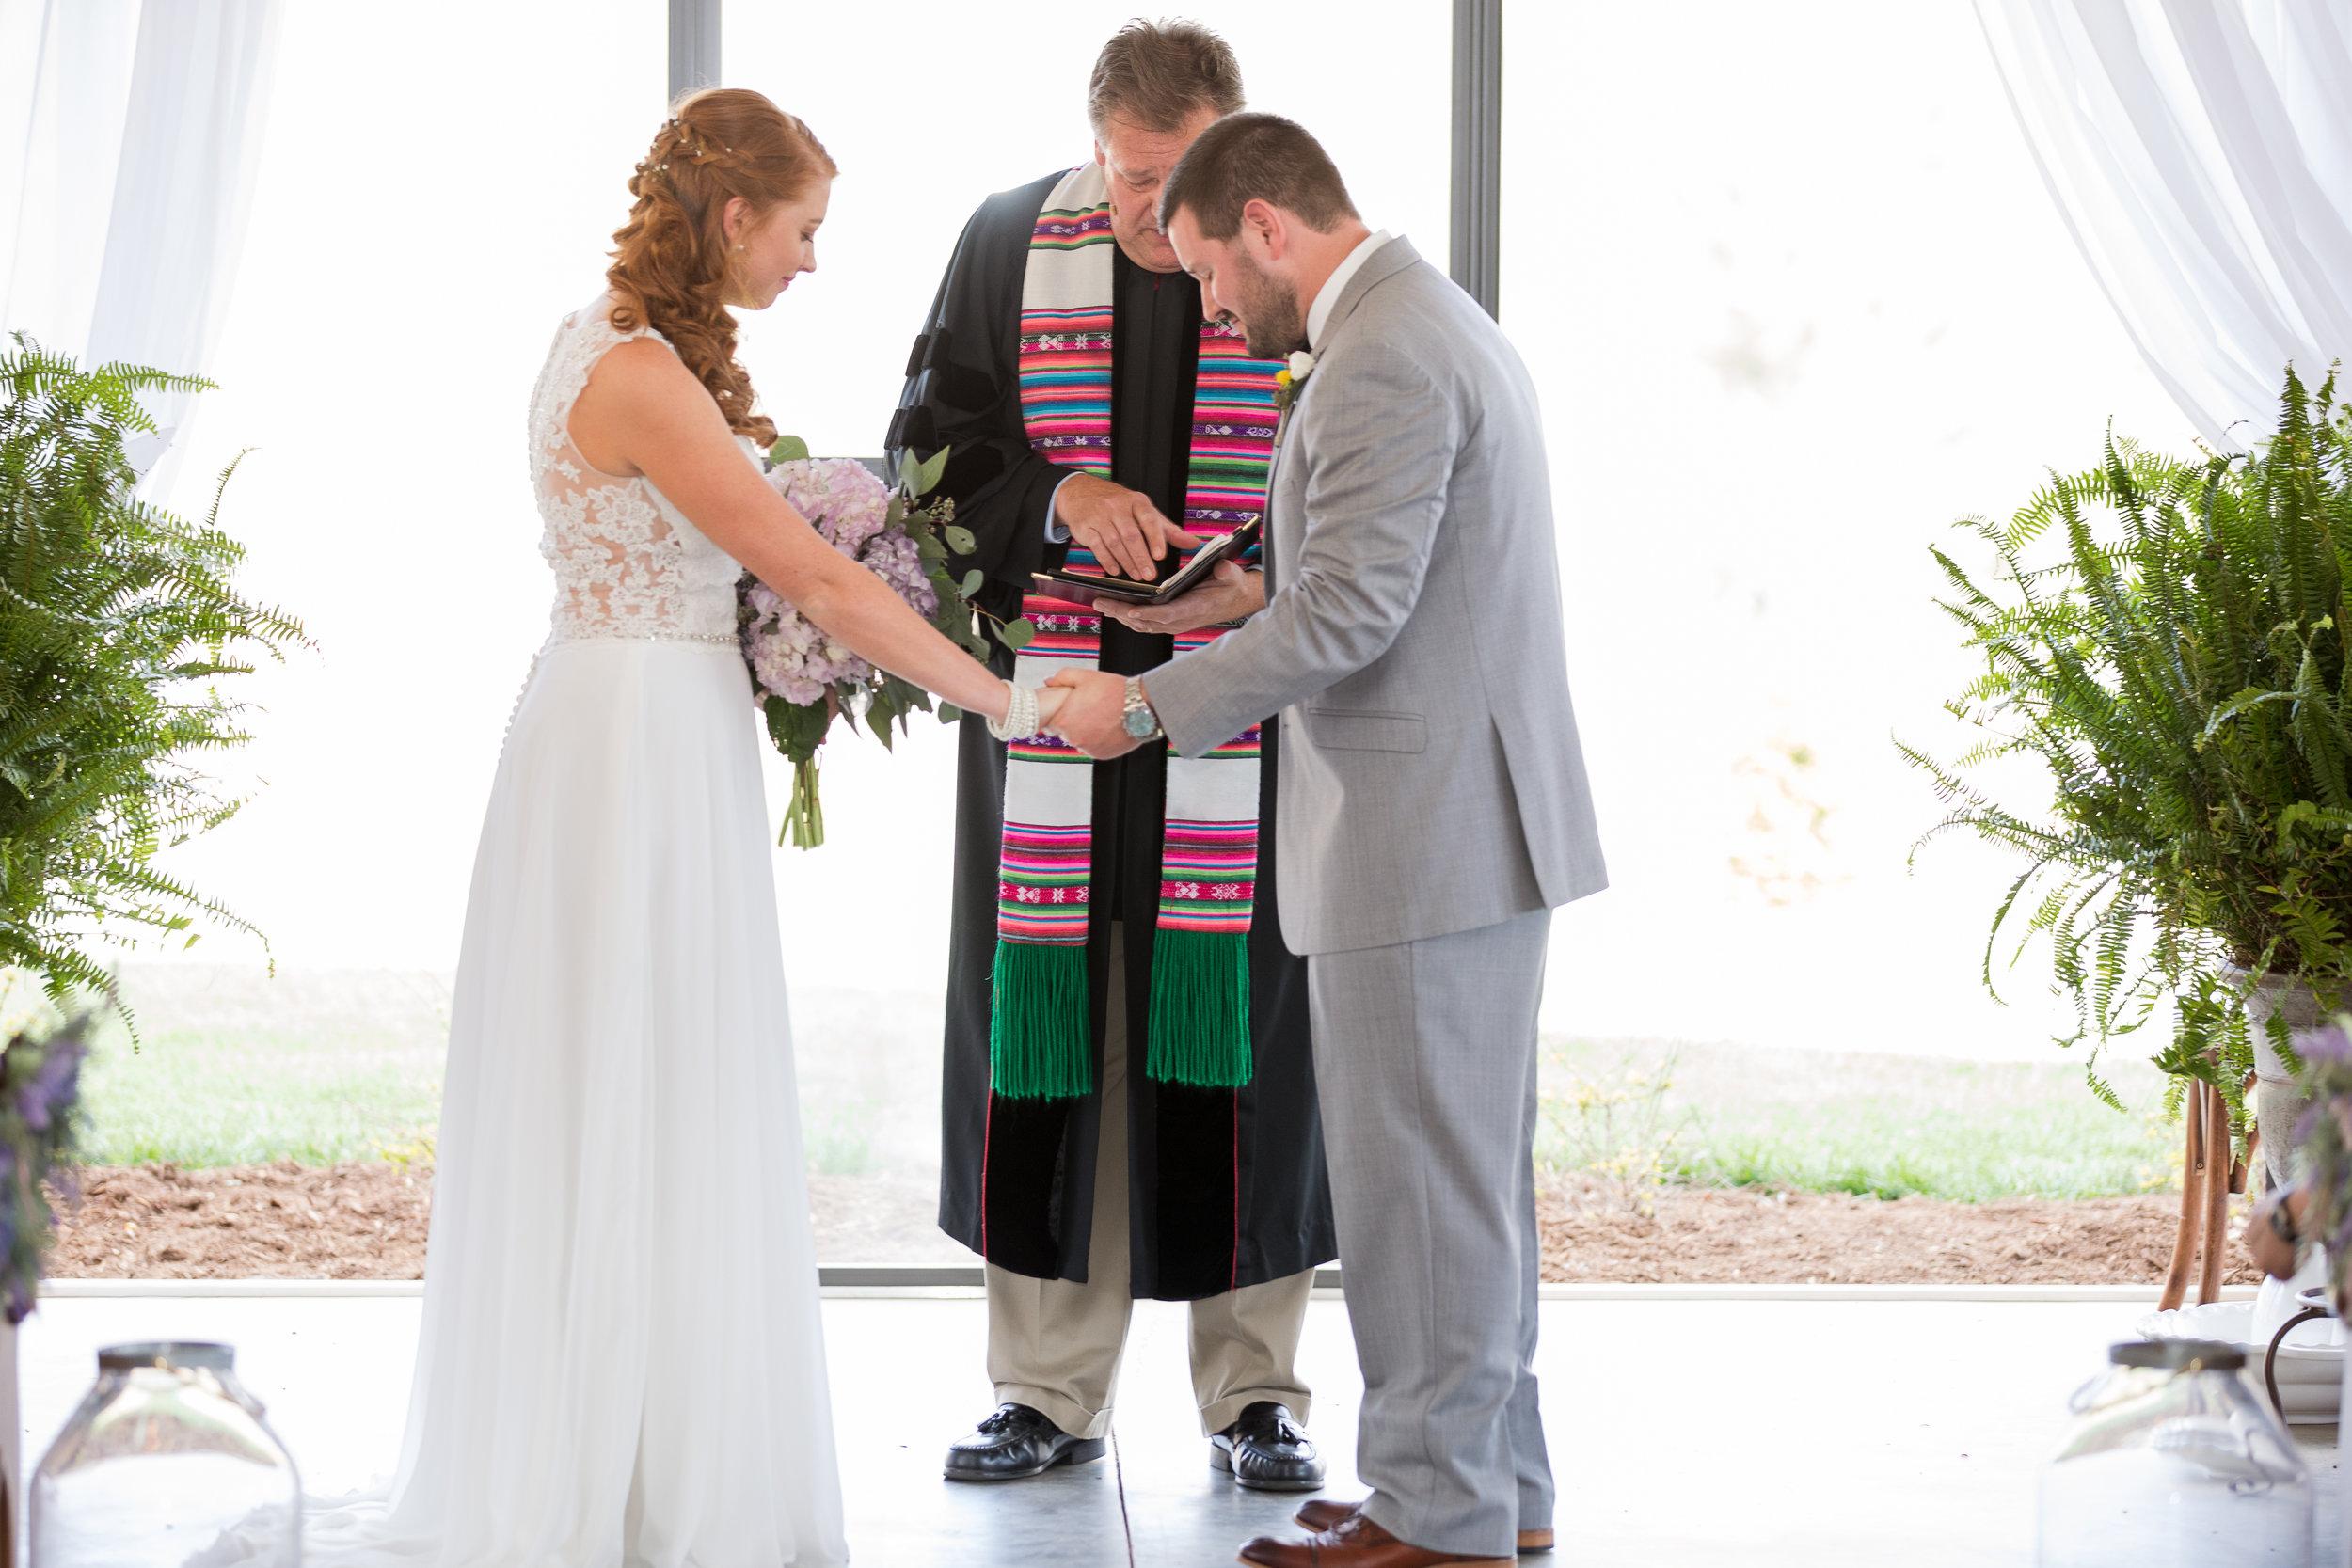 Joy-Unscripted-Wedding-Calligraphy-Arney-347.jpg